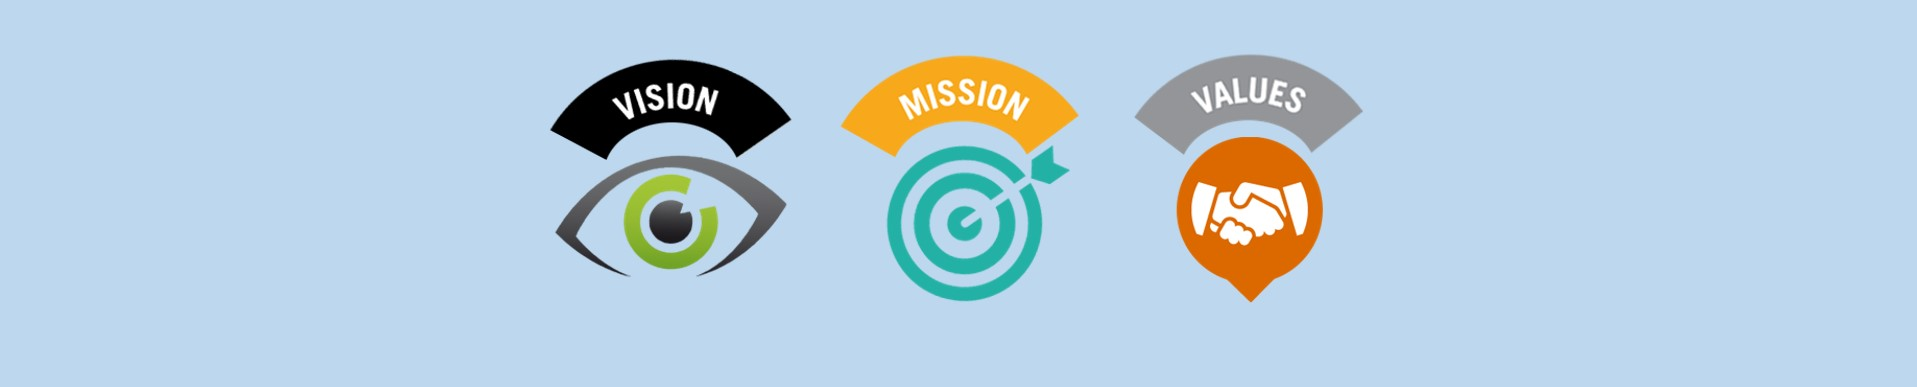 vision mision valores4.jpg